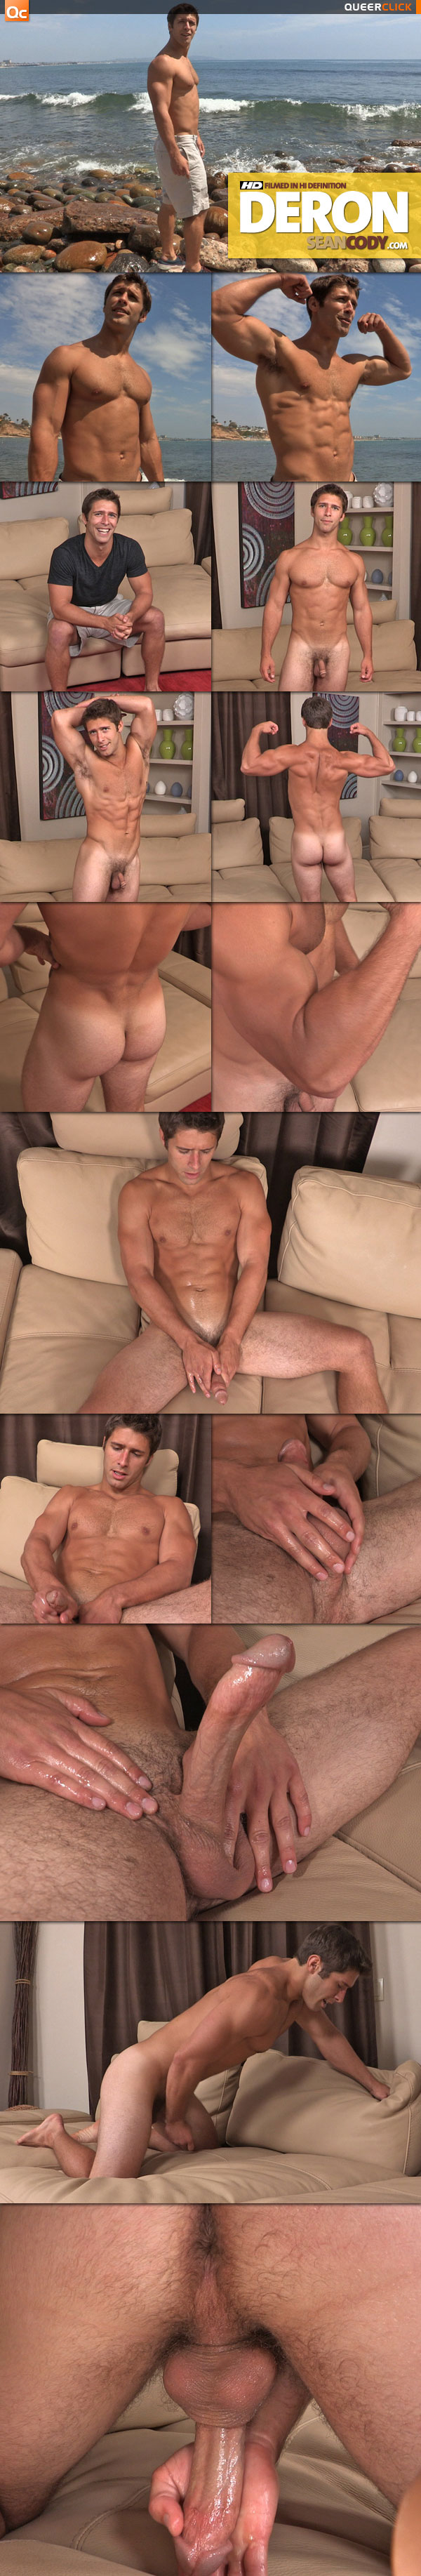 Sean Cody: Deron